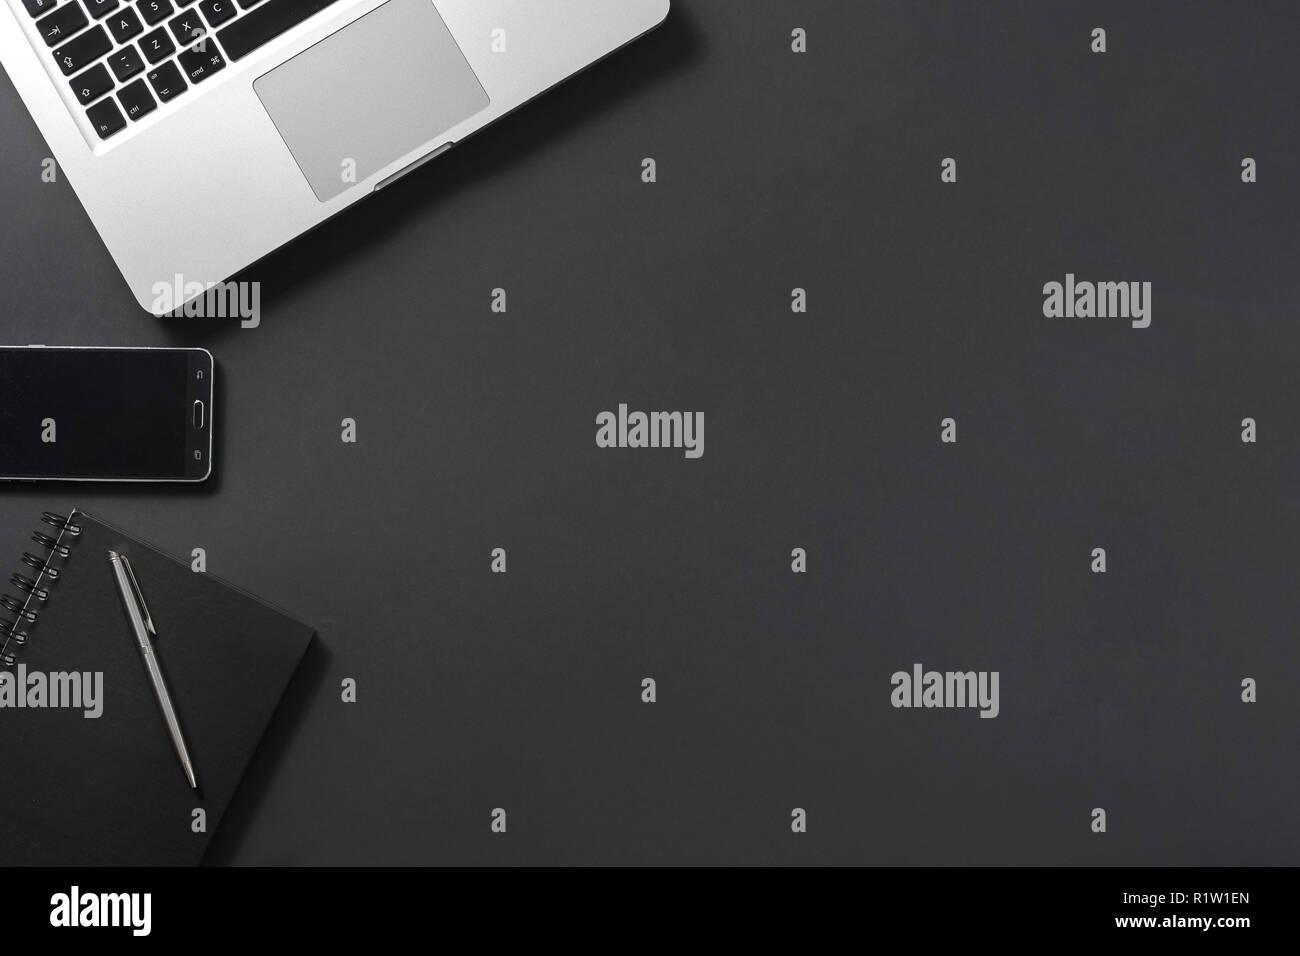 Laptop on black background copyspace textspace socialmedia - Stock Image